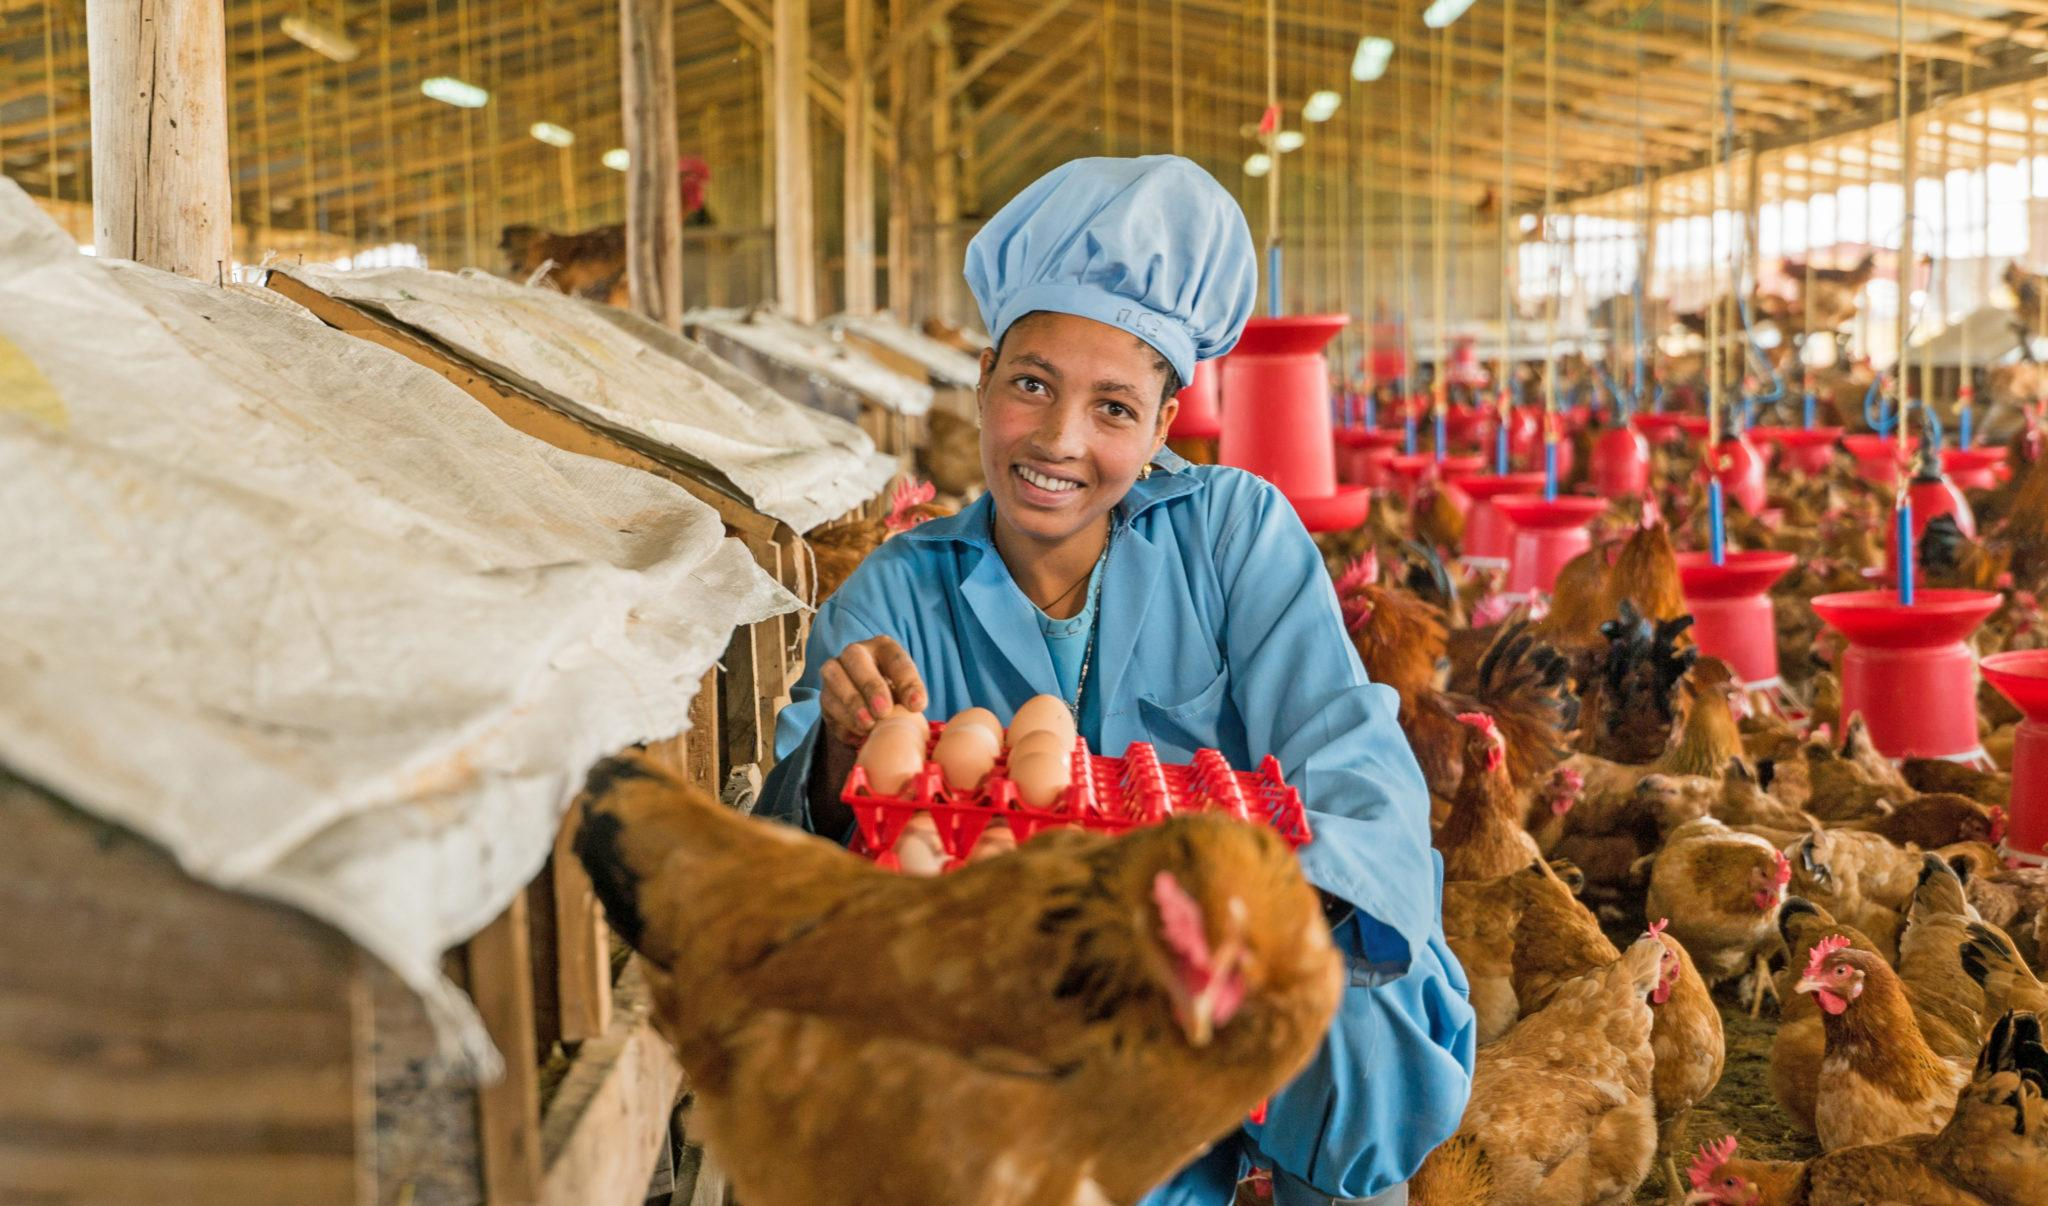 An employee of EthioChicken in a hen house holding an egg carton